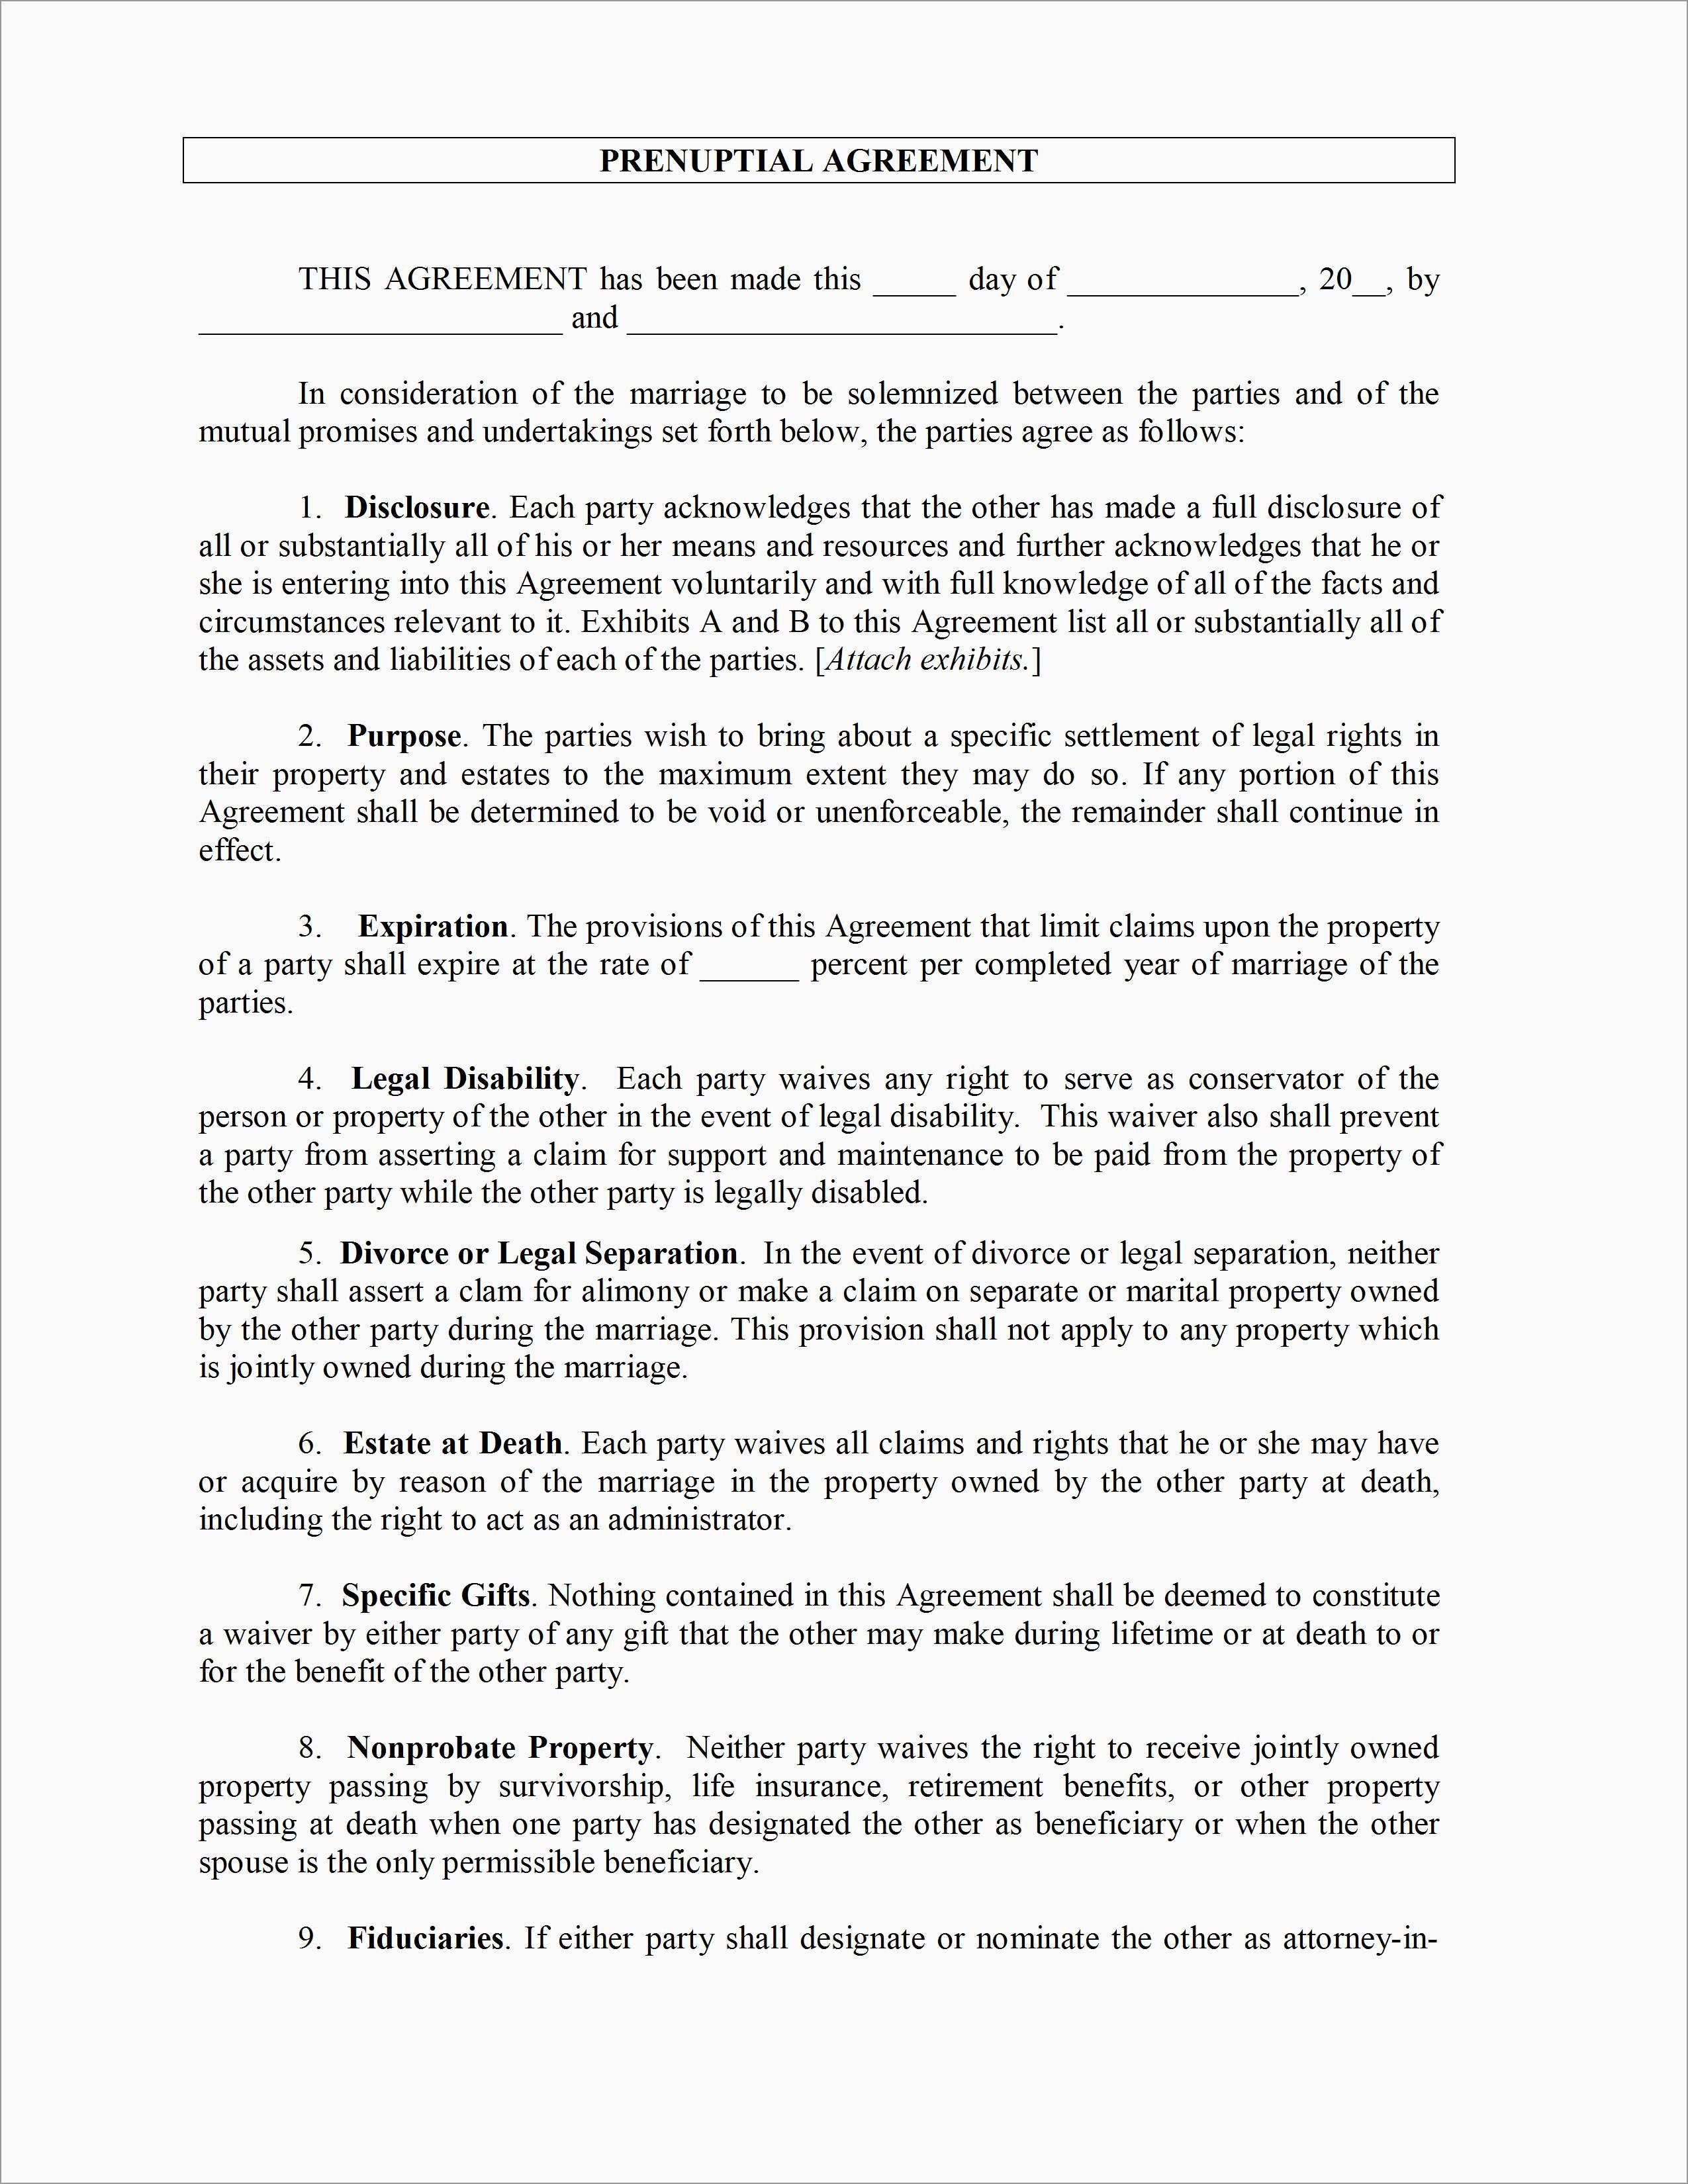 Prenup Template Free Fabulous Prenuptial Agreement Template   Best - Free Printable Prenuptial Agreement Form